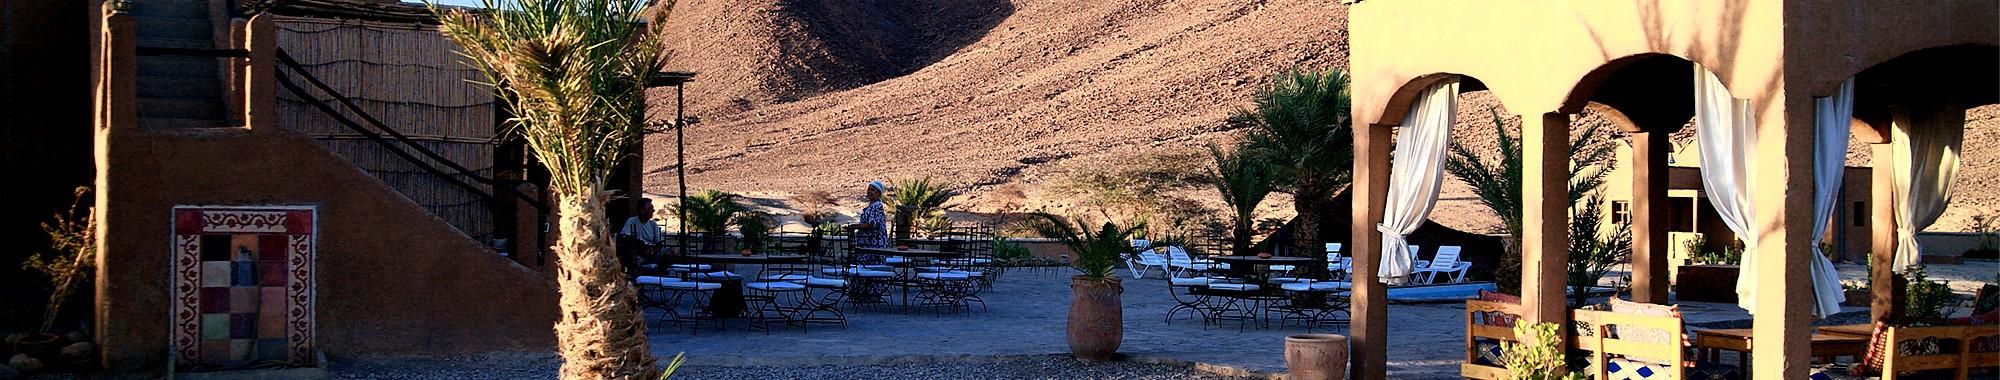 Hebergement auberge sud Maroc